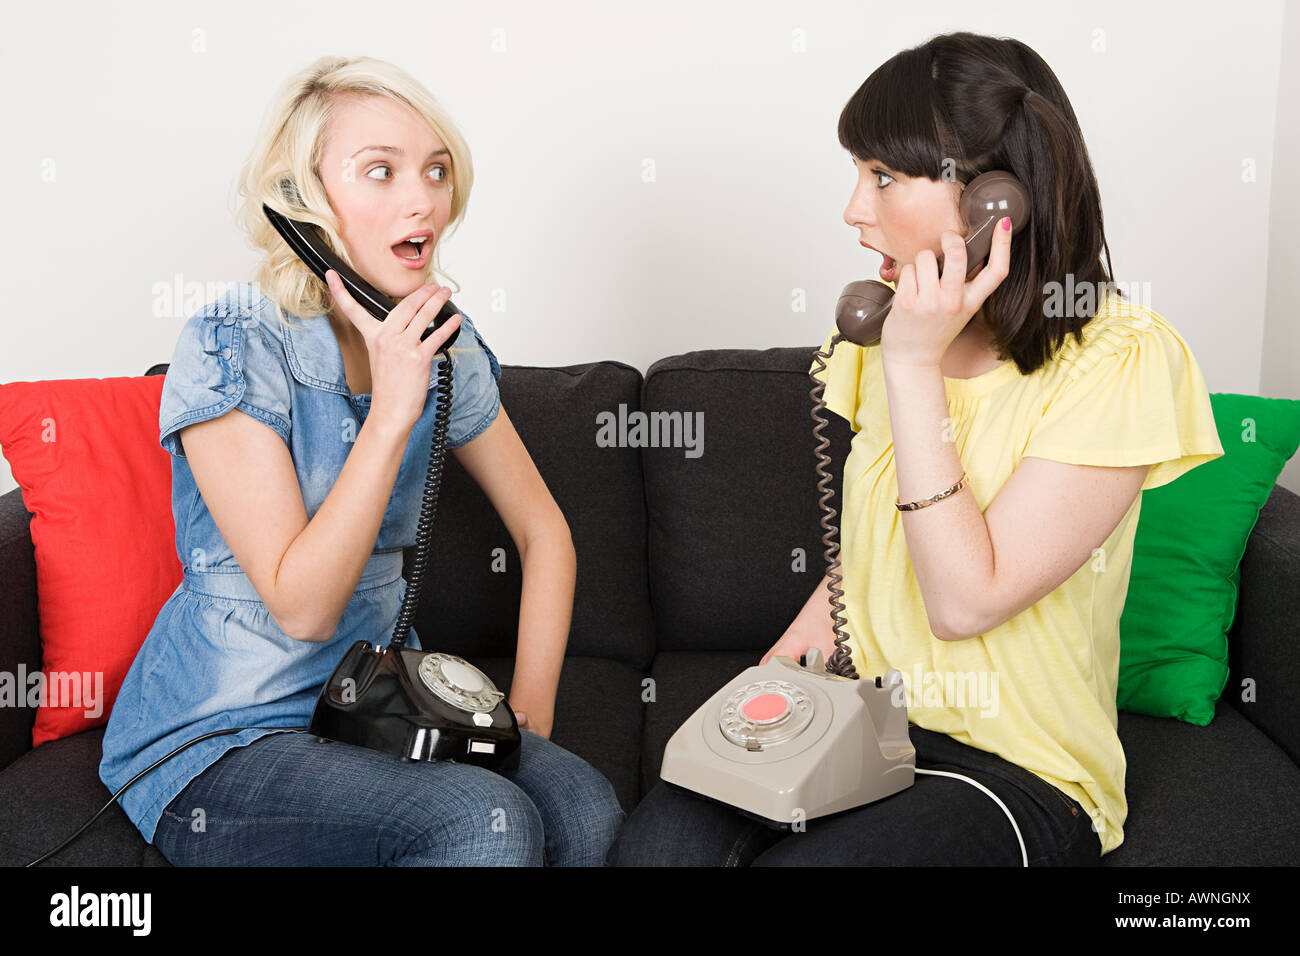 Two women having telephone conversations - Stock Image